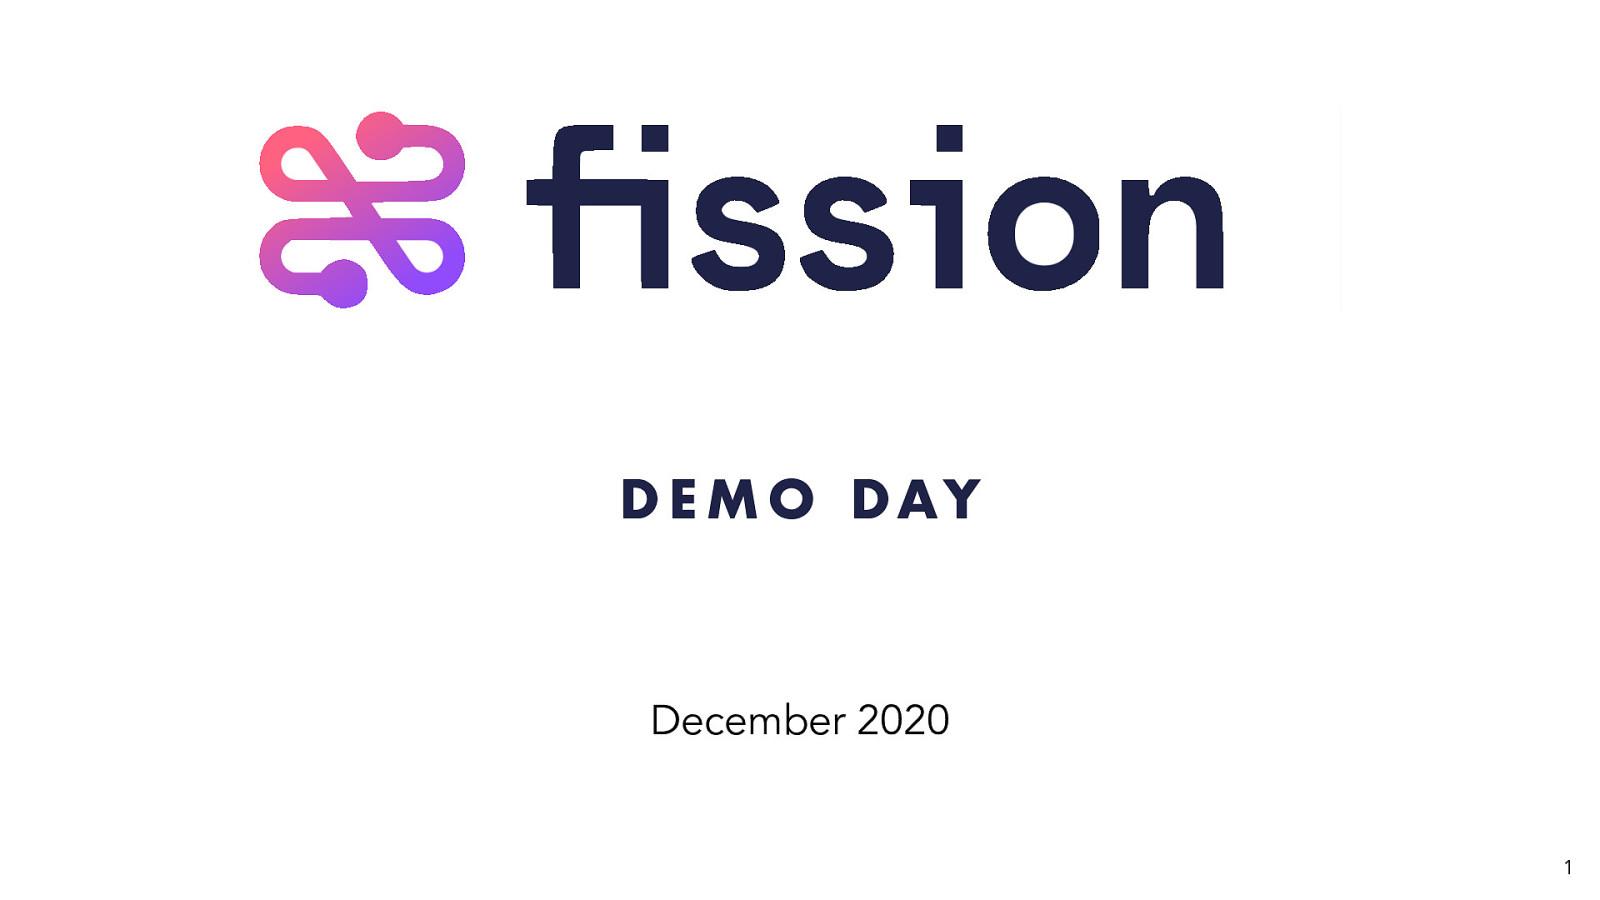 Fission Demo Day December 2020